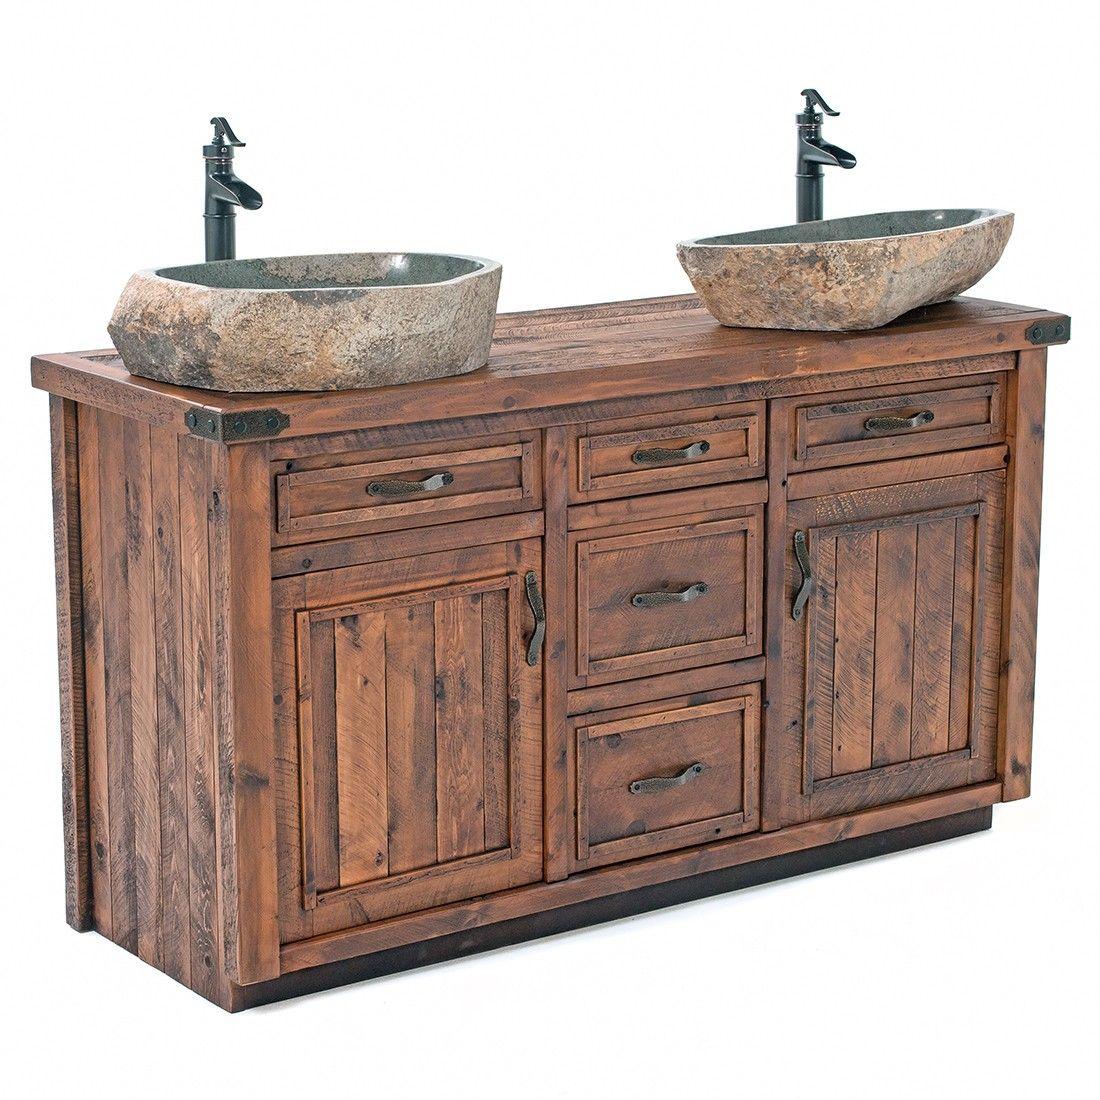 Timber Haven Rustic Barn Wood Vanity 48 72 Rustic Bathroom Vanities Wood Vanity Bathroom Red